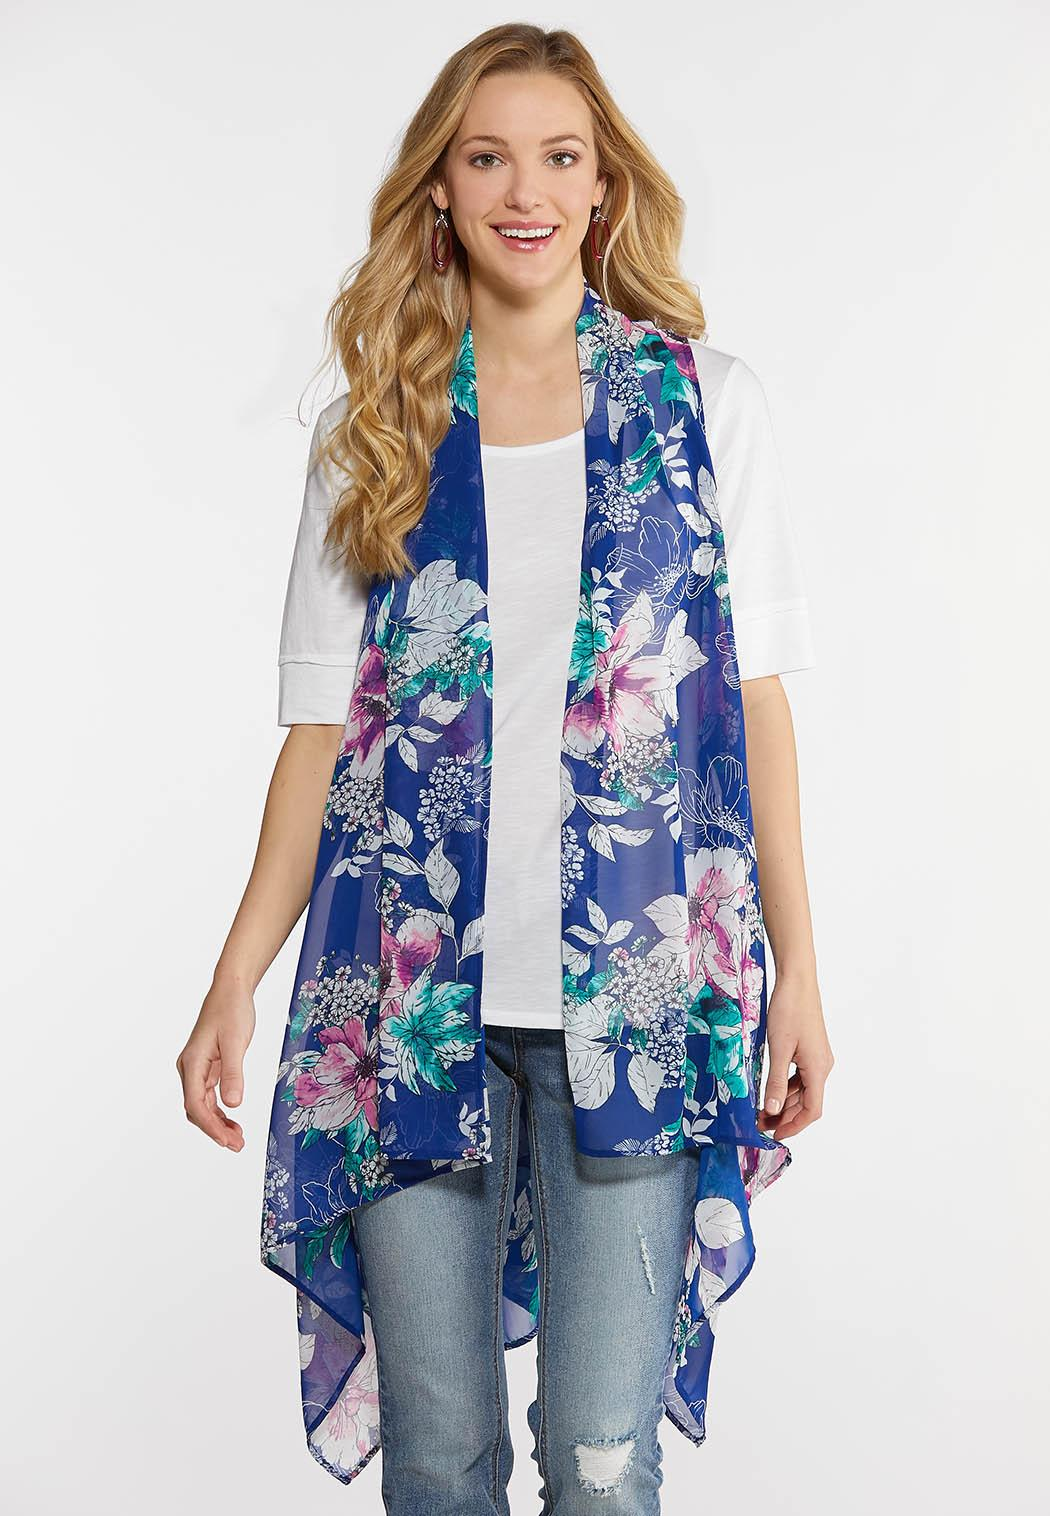 Plus Size Sheer Floral Vest